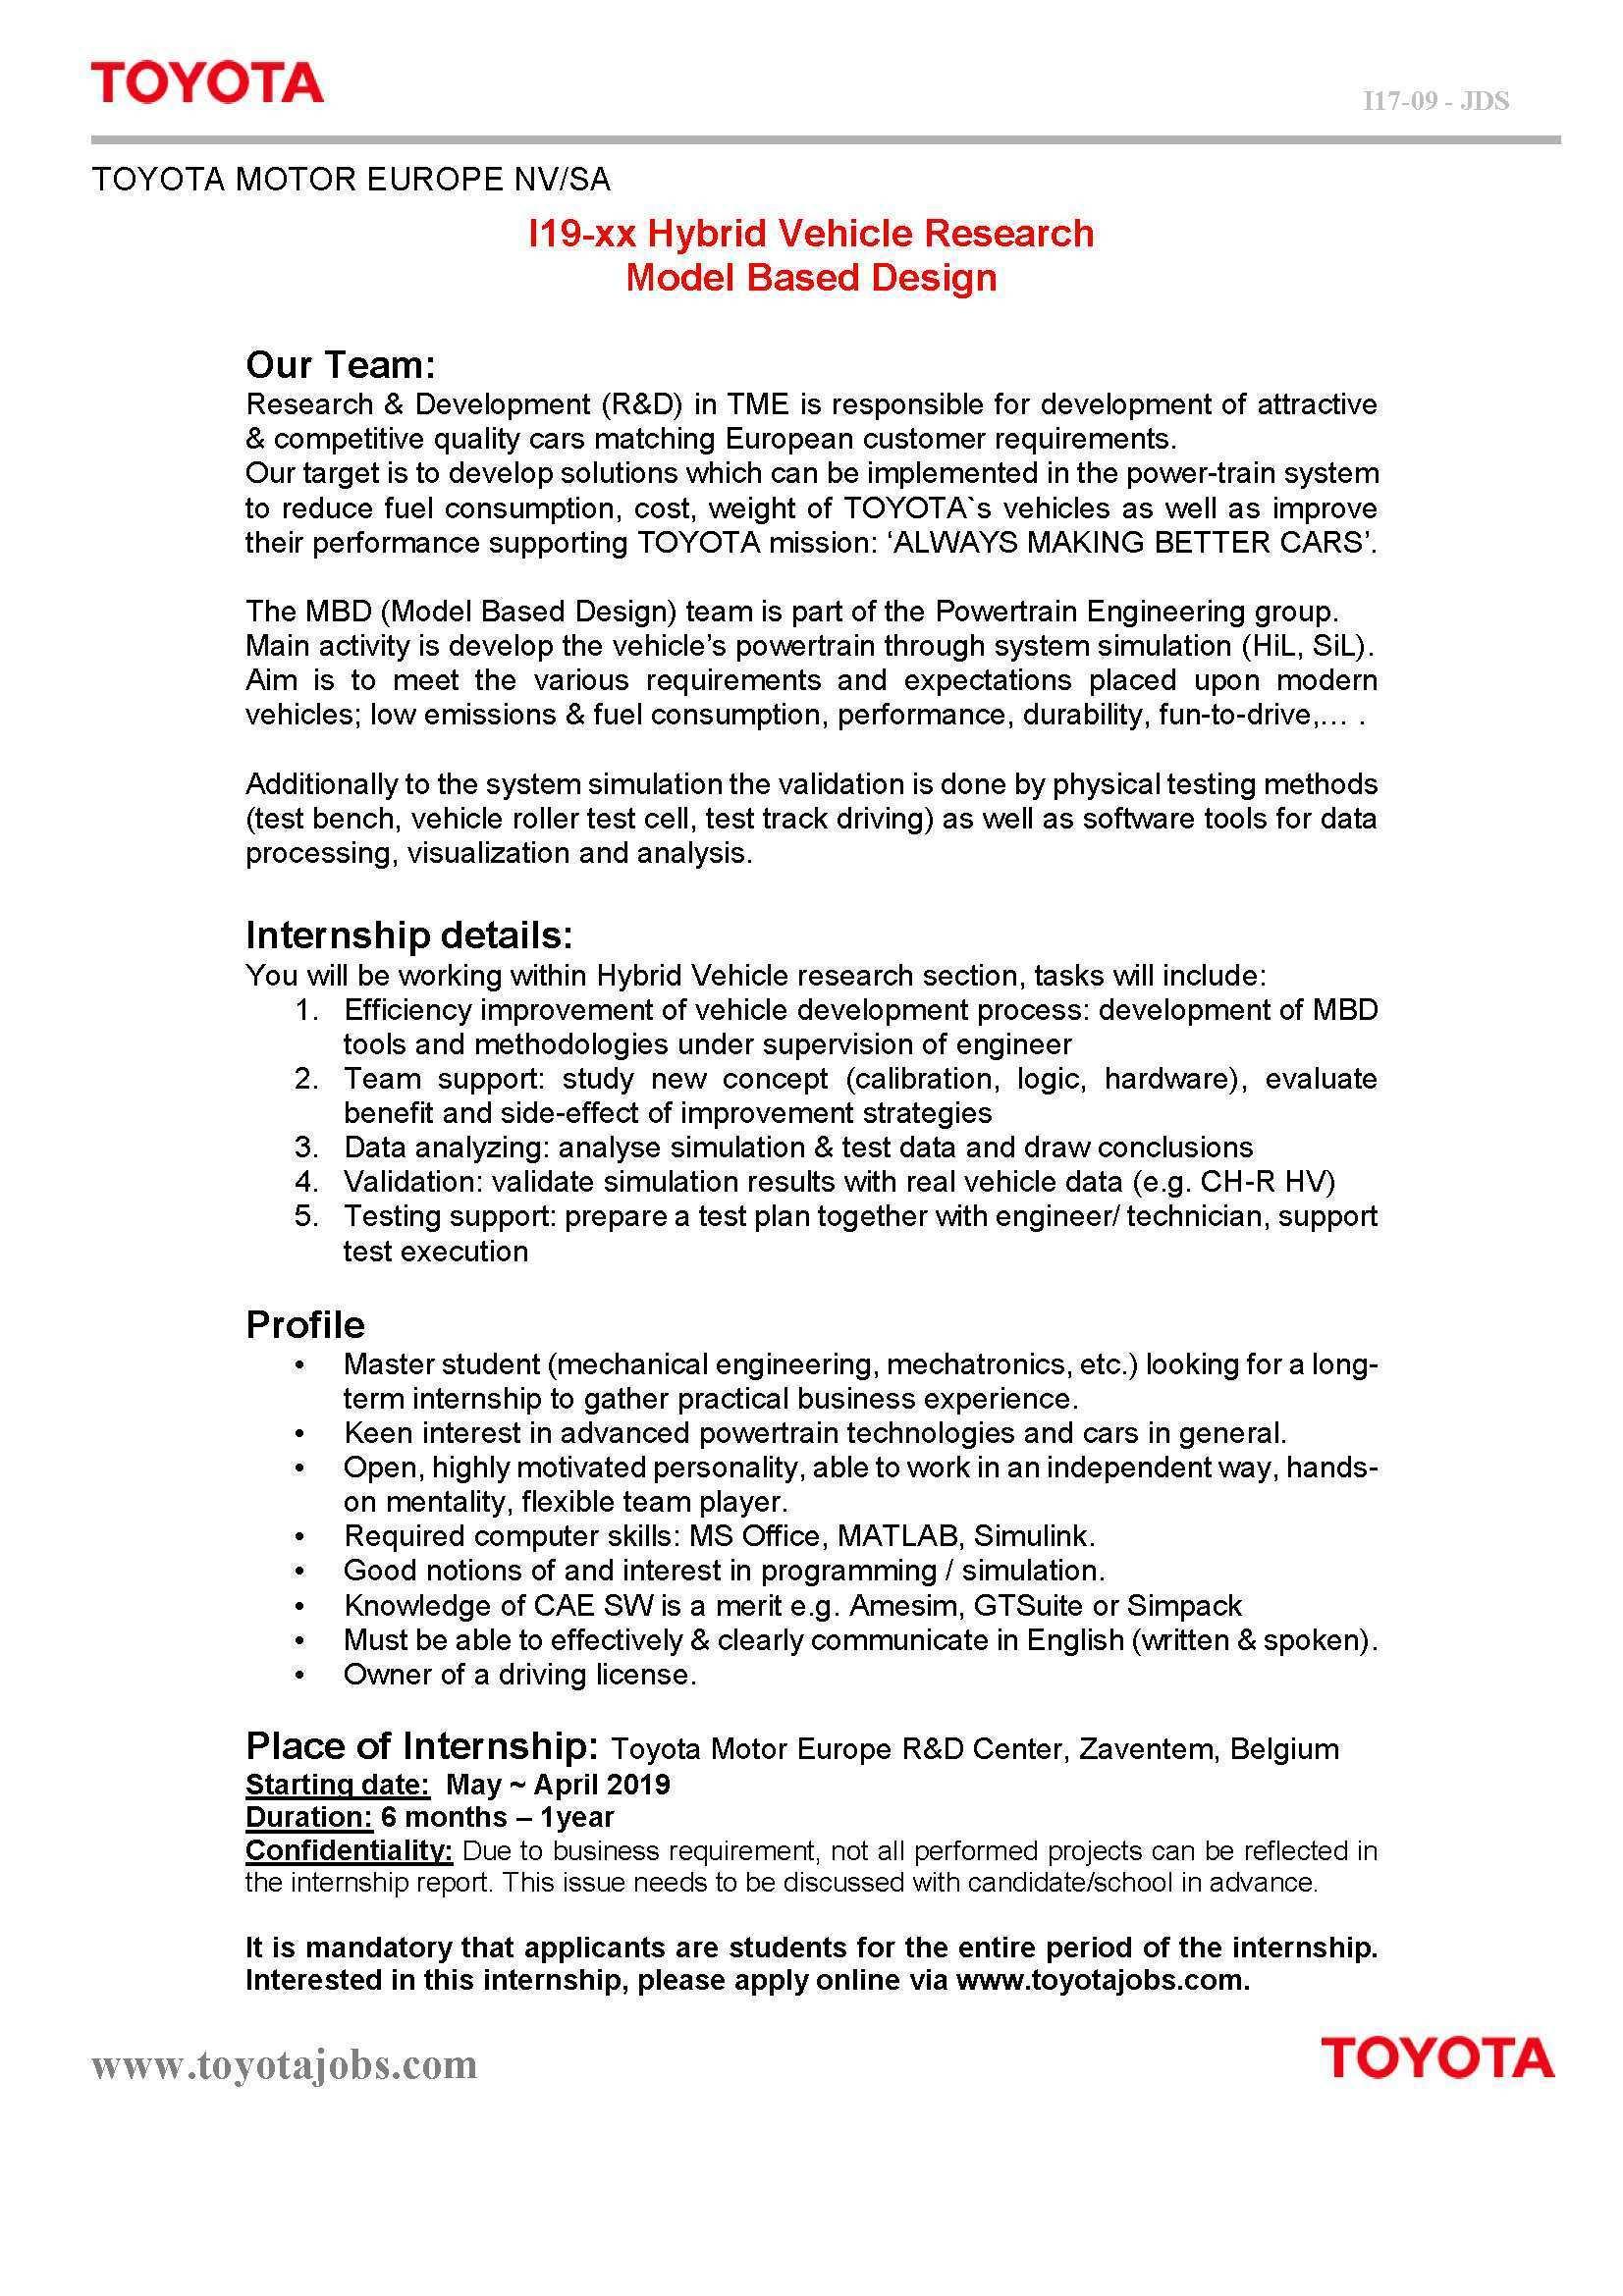 33 Concept of Toyota Internship 2019 Spesification by Toyota Internship 2019